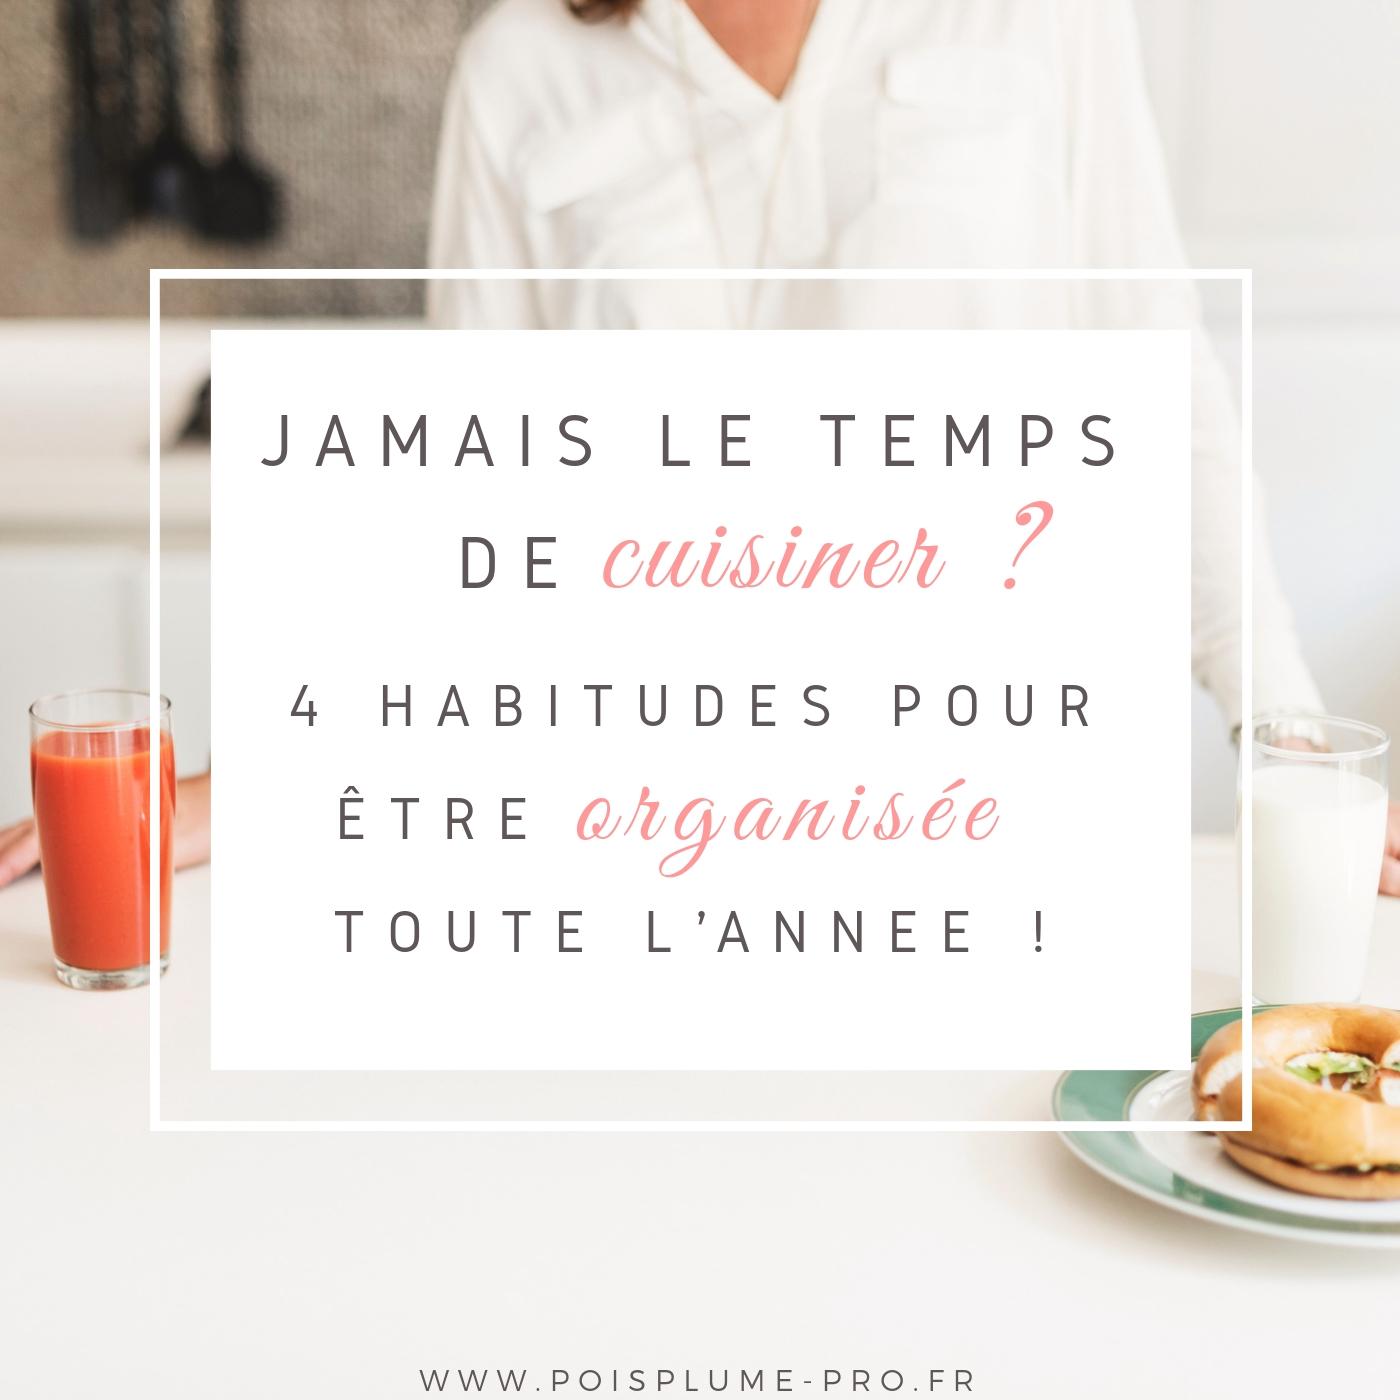 jamais_temps_cuisiner_habitudes_zero_dechet (2)